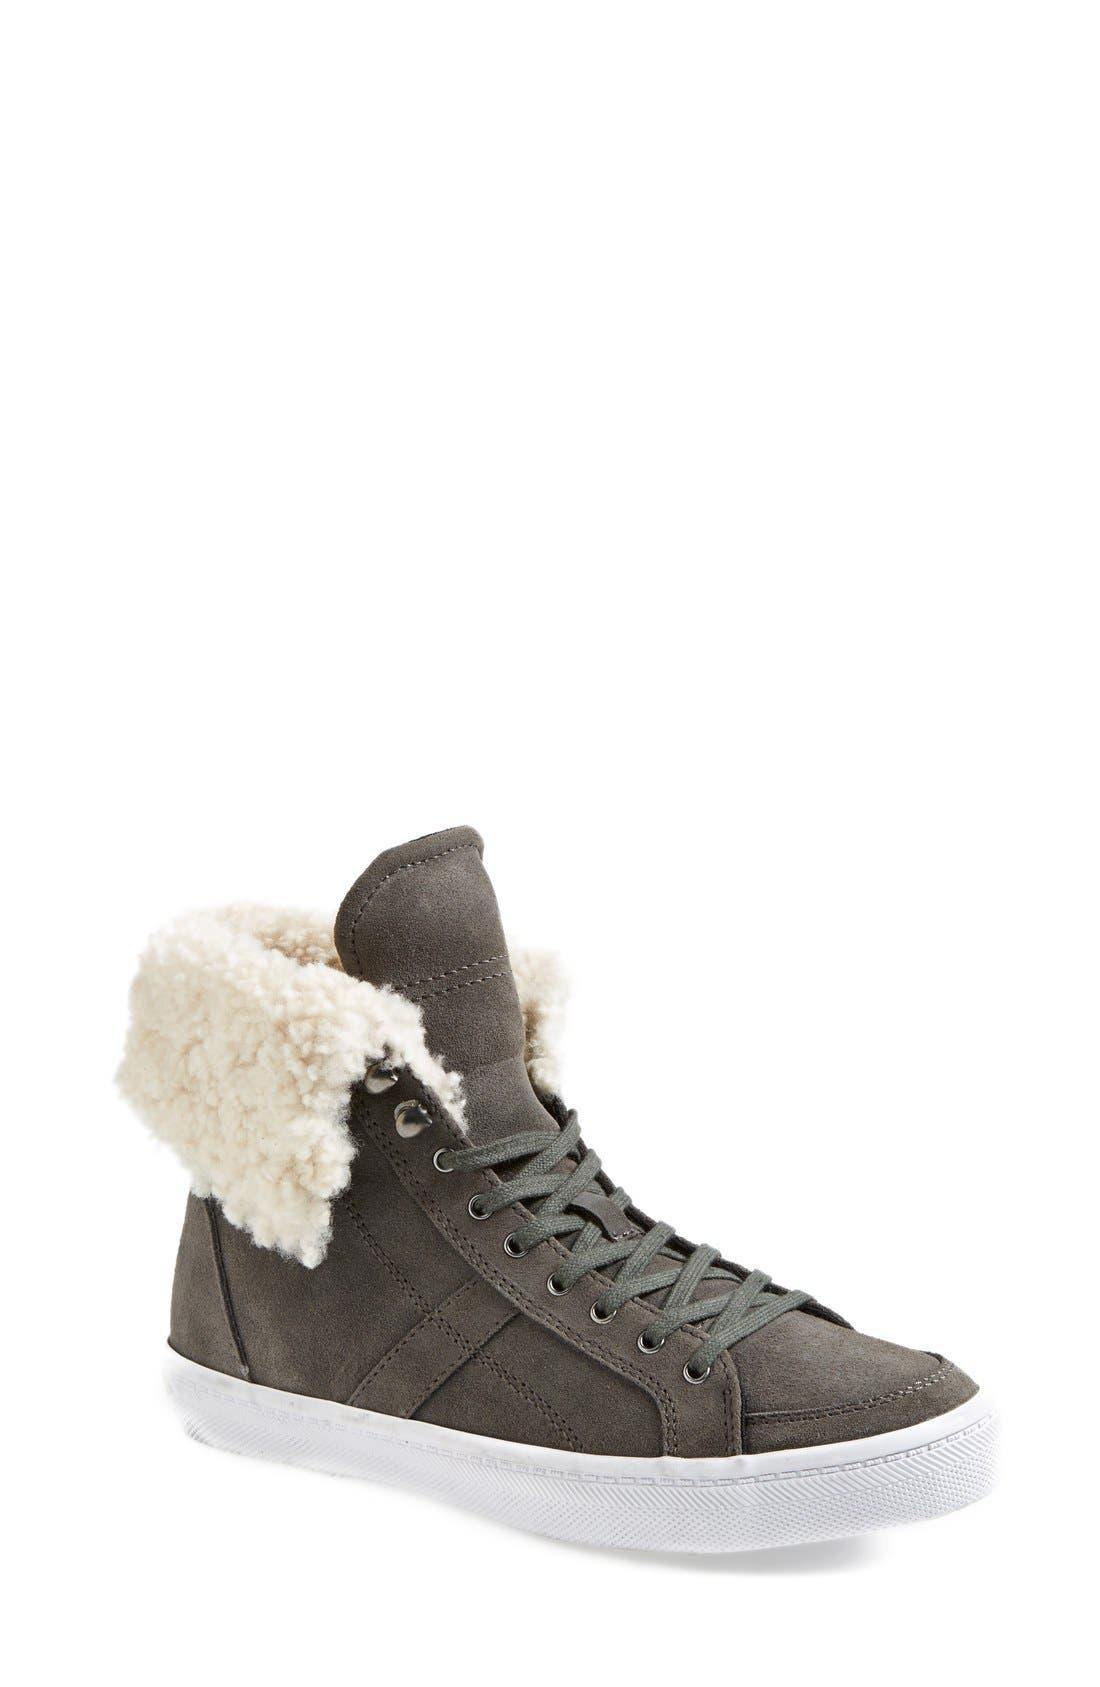 REBECCA MINKOFF,                             'Sasha' Suede High Top Sneaker,                             Main thumbnail 1, color,                             020